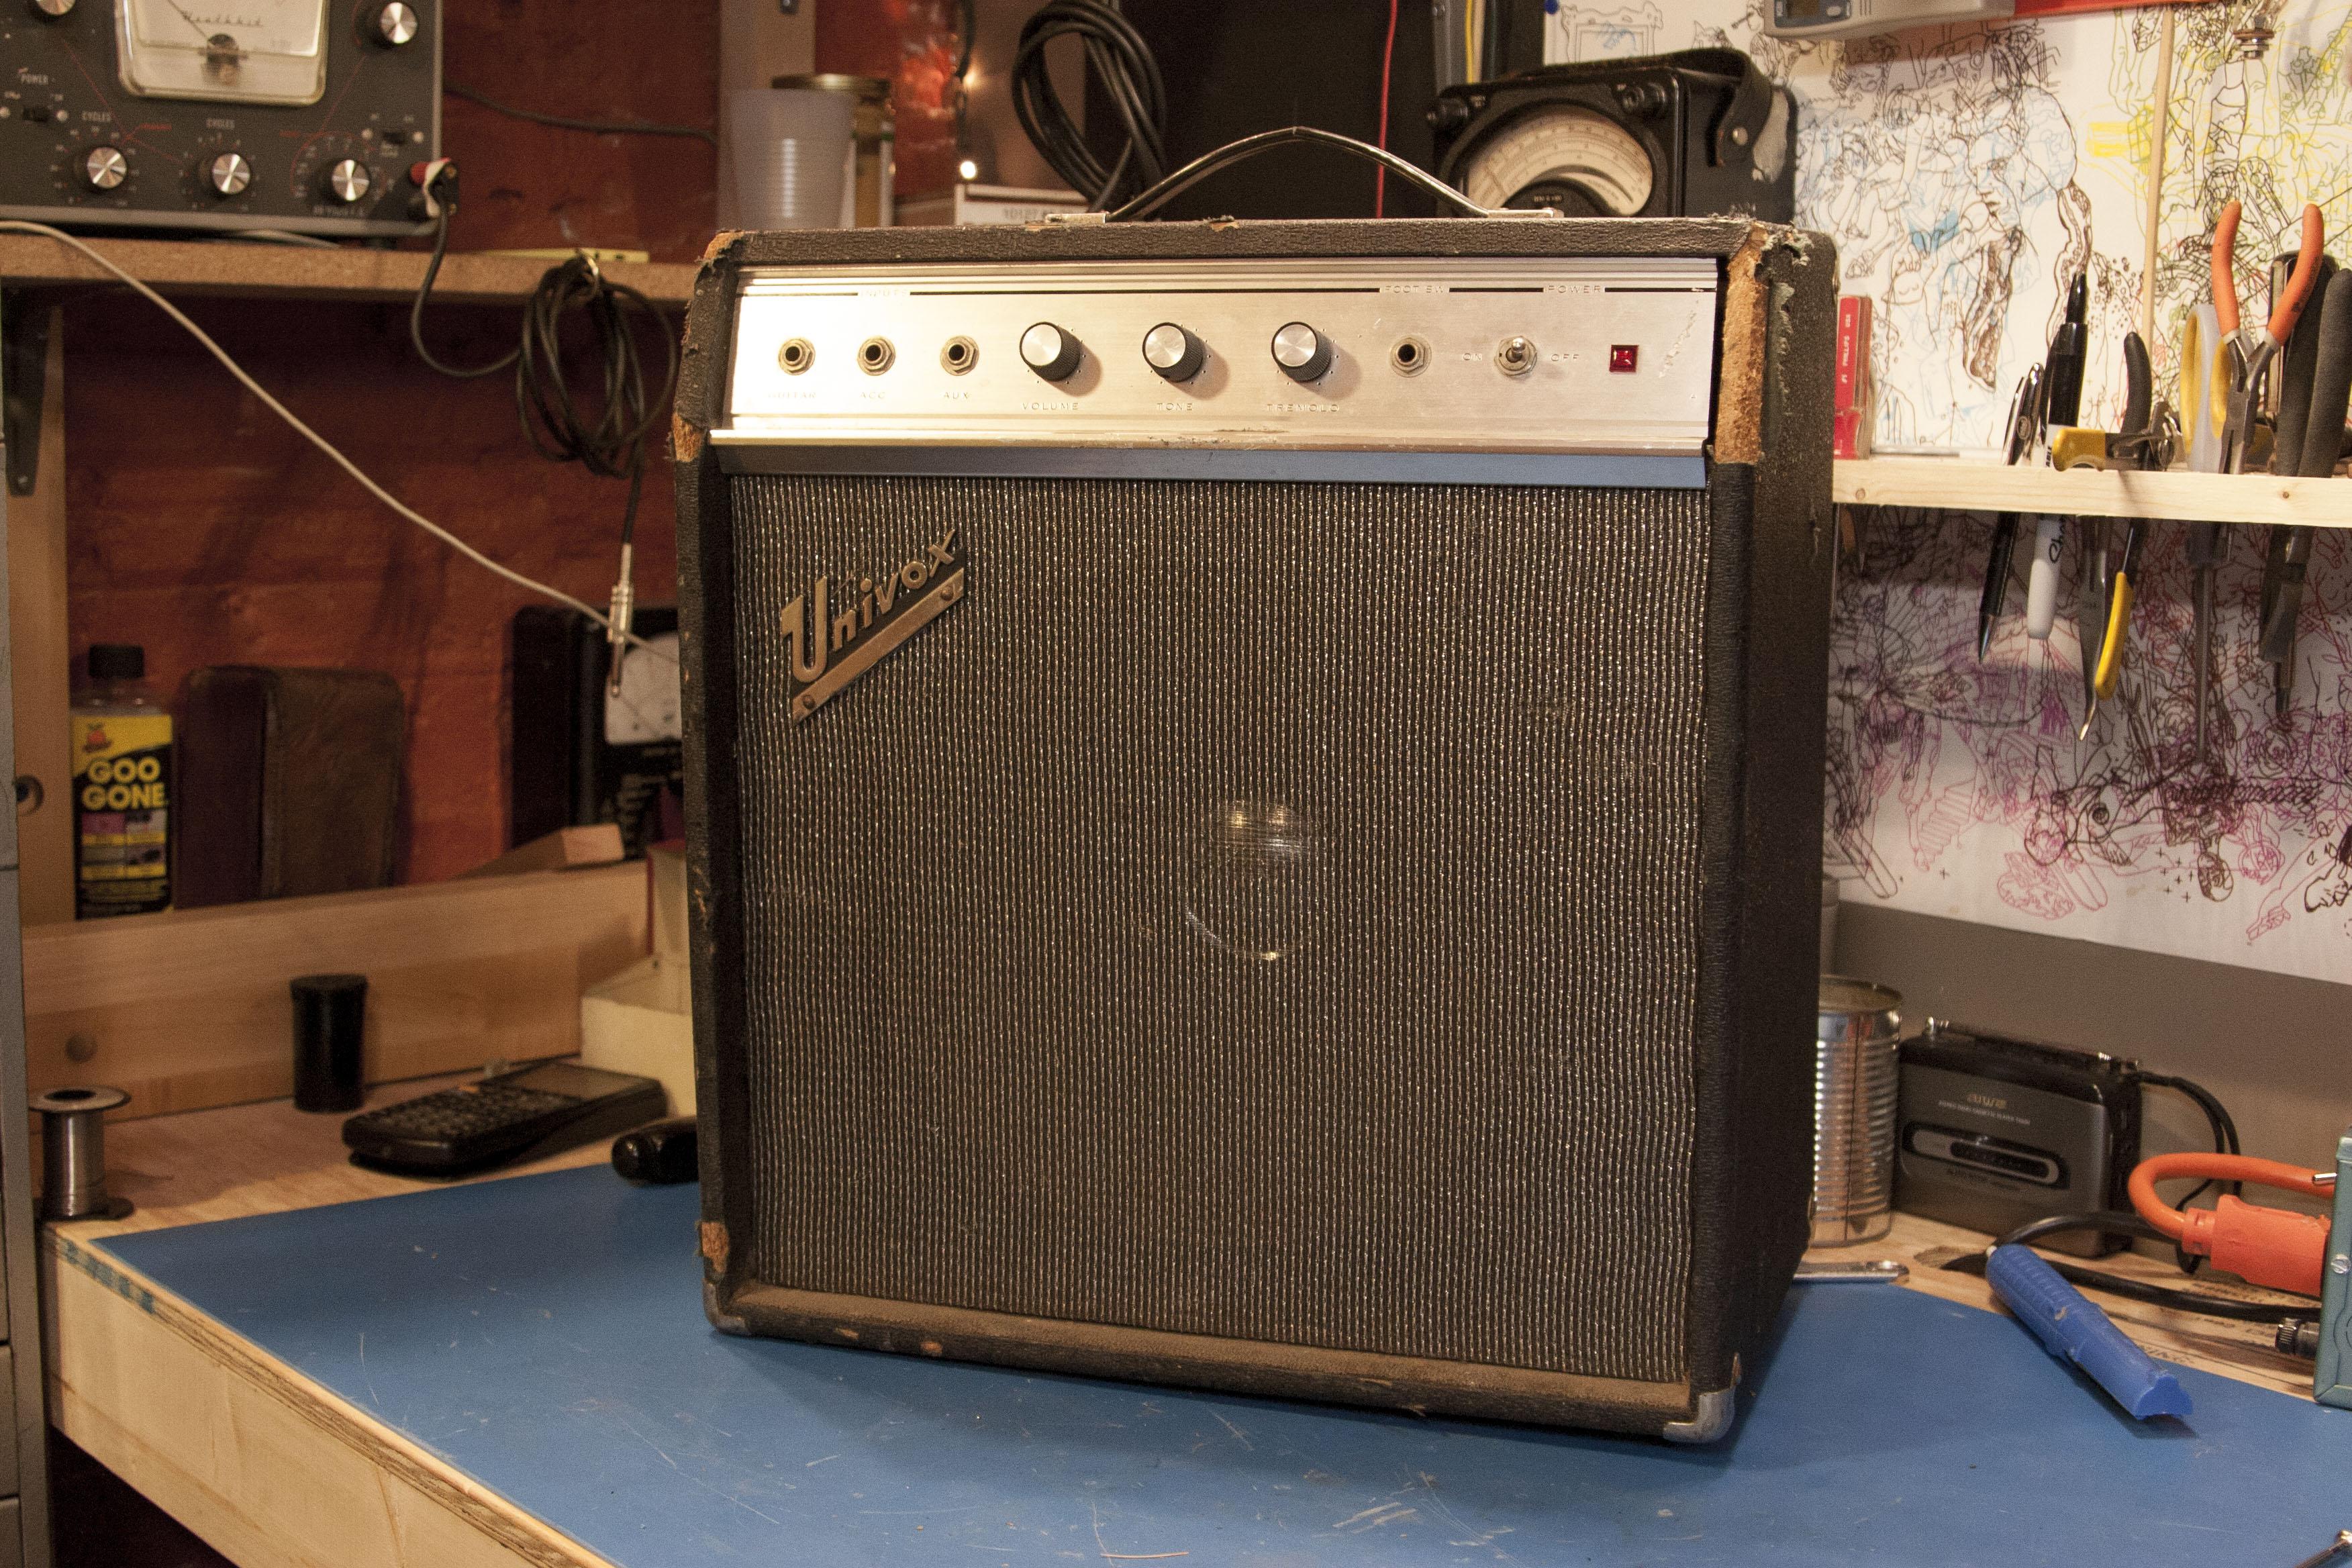 Univox U 45b Iration Audio Sears Silver Tone Guitar On Schematic Of Electric Tremolo U45b Full